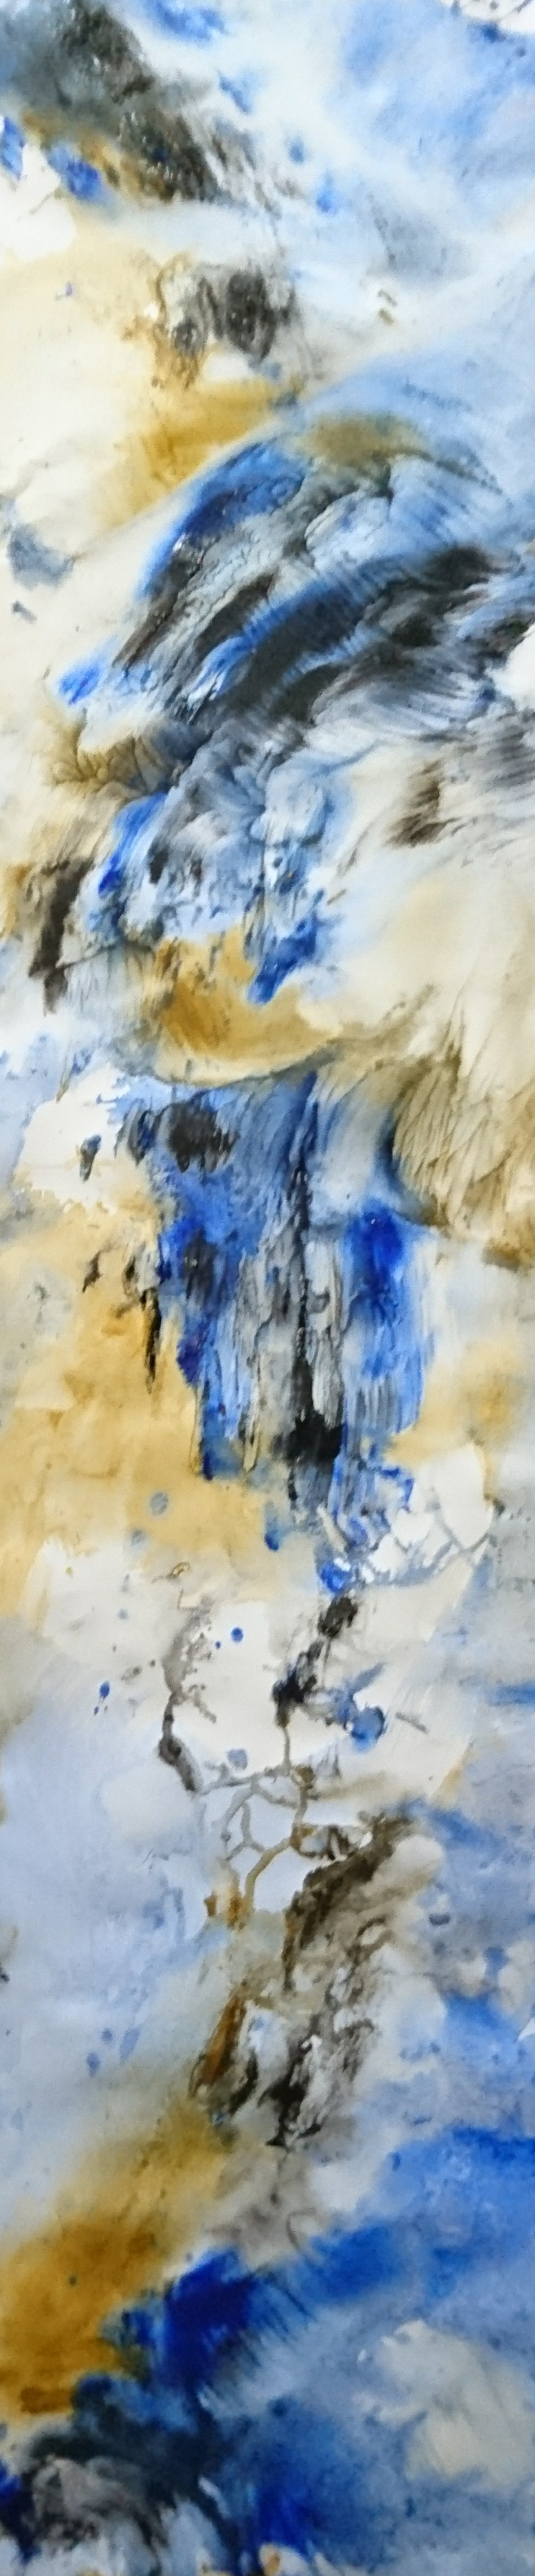 Yu Zhao, Bleu flux, tempera/paper/canvas, 150x30cm, 2017